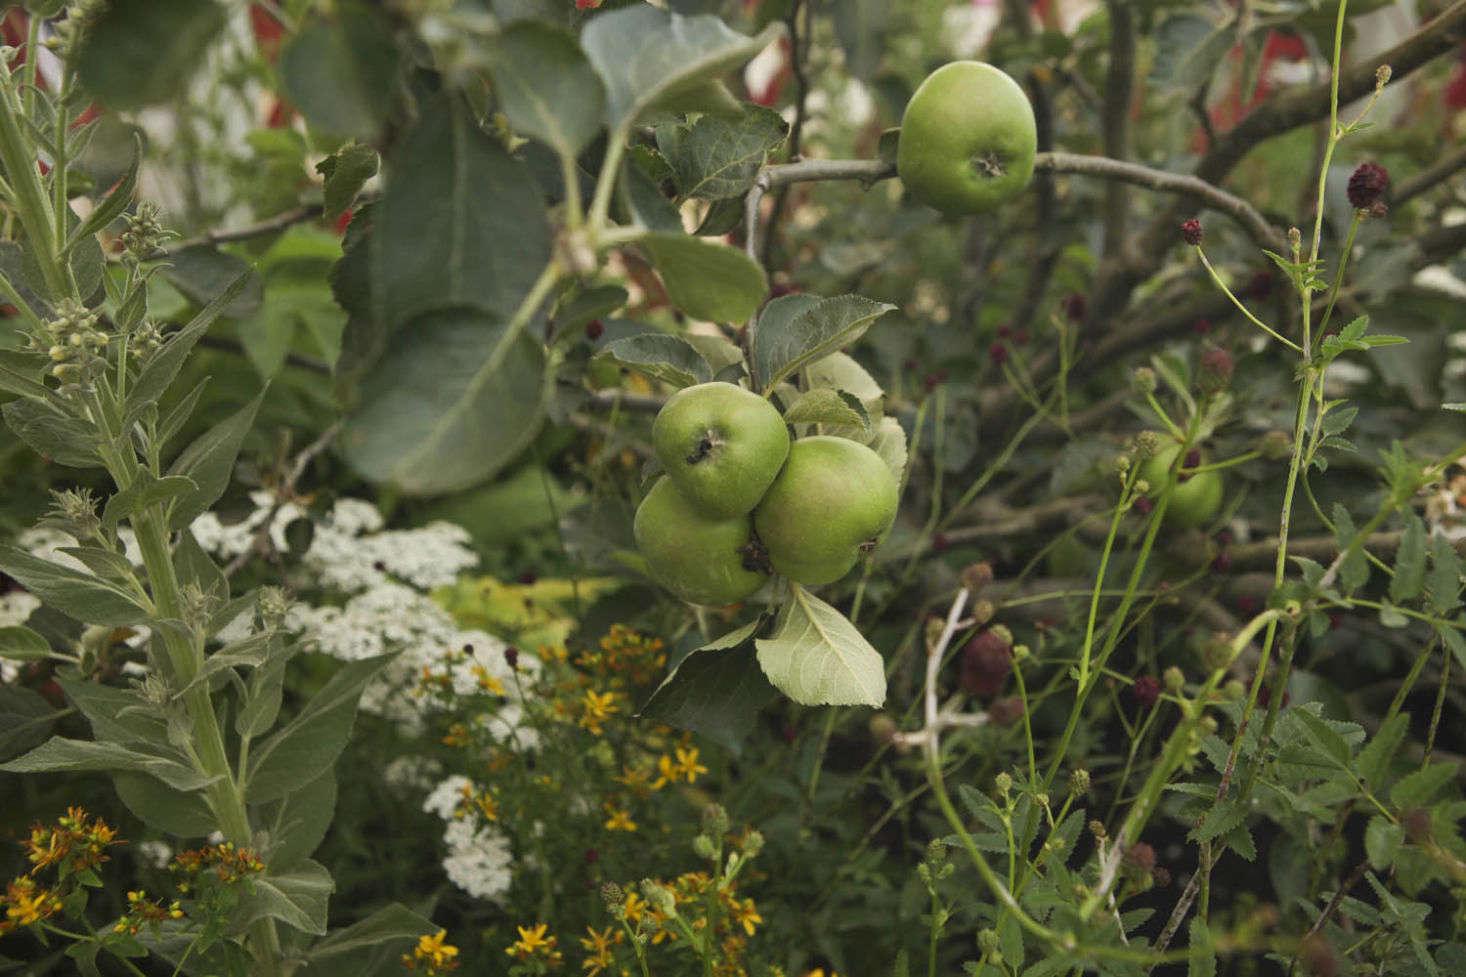 An apple tree grows amid yellow St. John&#8